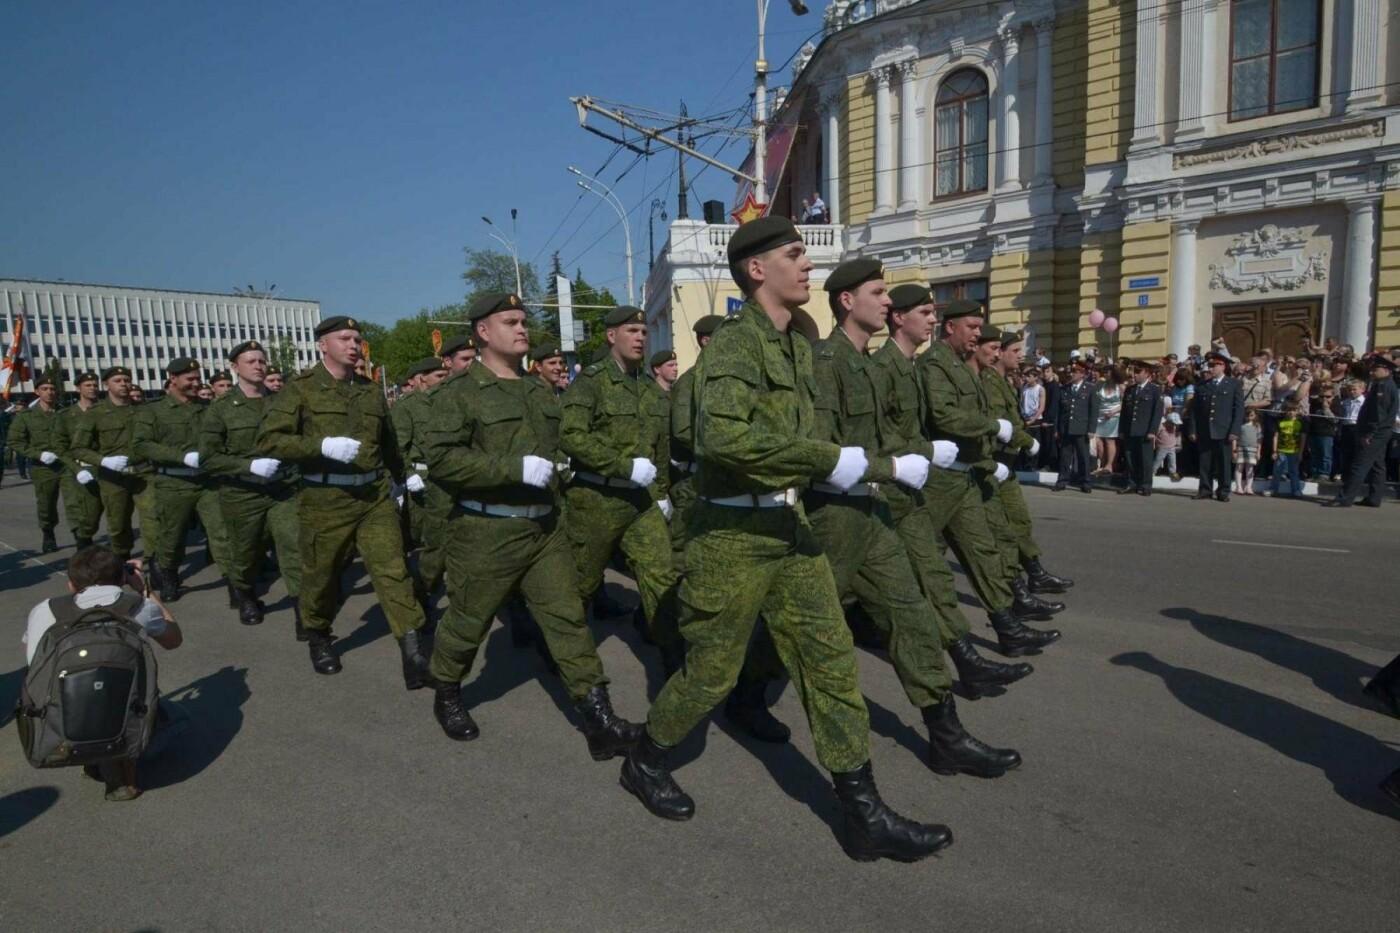 Тамбовчан зовут отметить 9 мая, фото-1